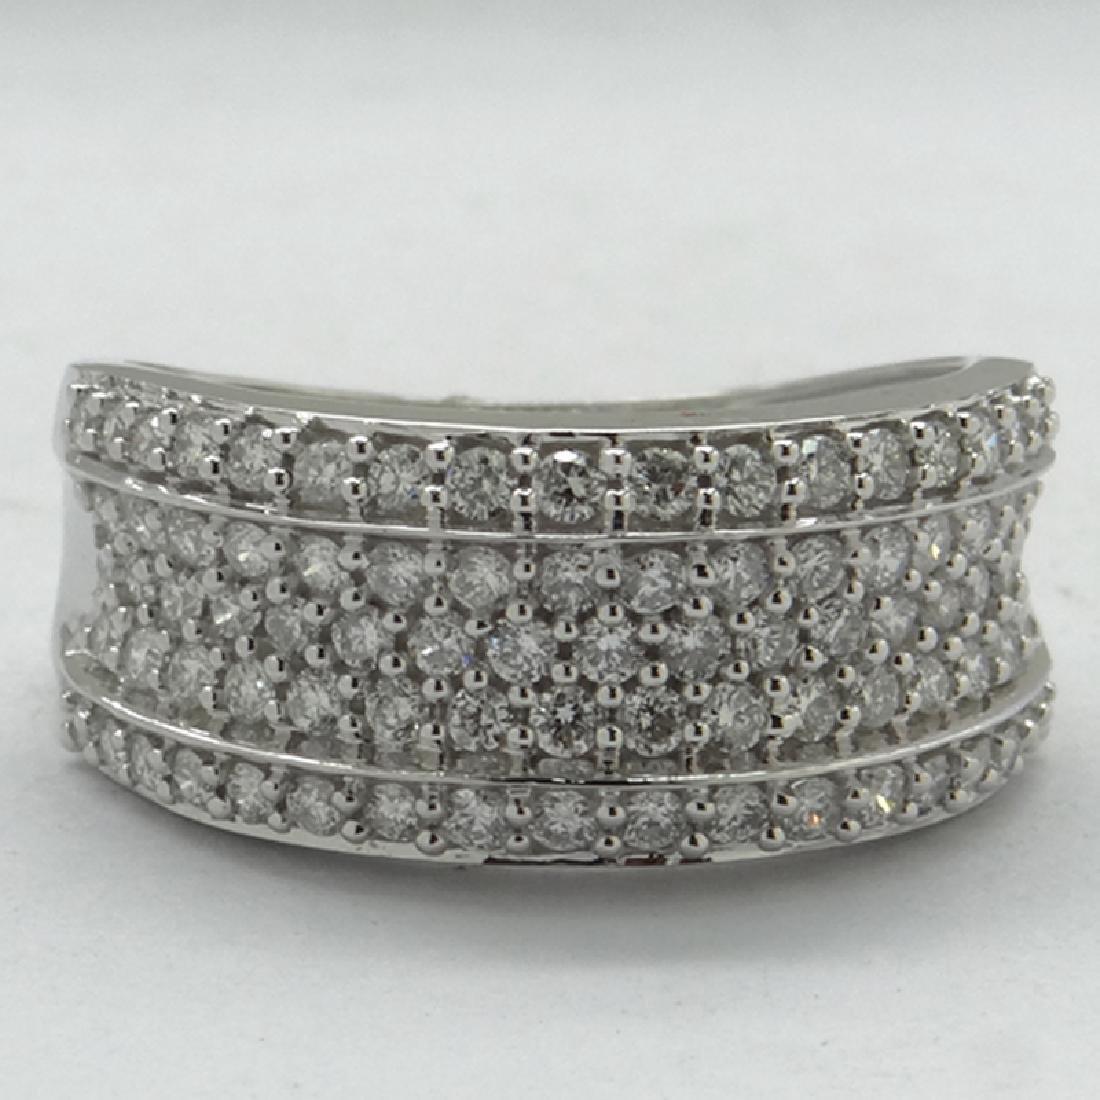 *Fine Jewelry 14 kt. White Gold, 0.87CT Round Cut